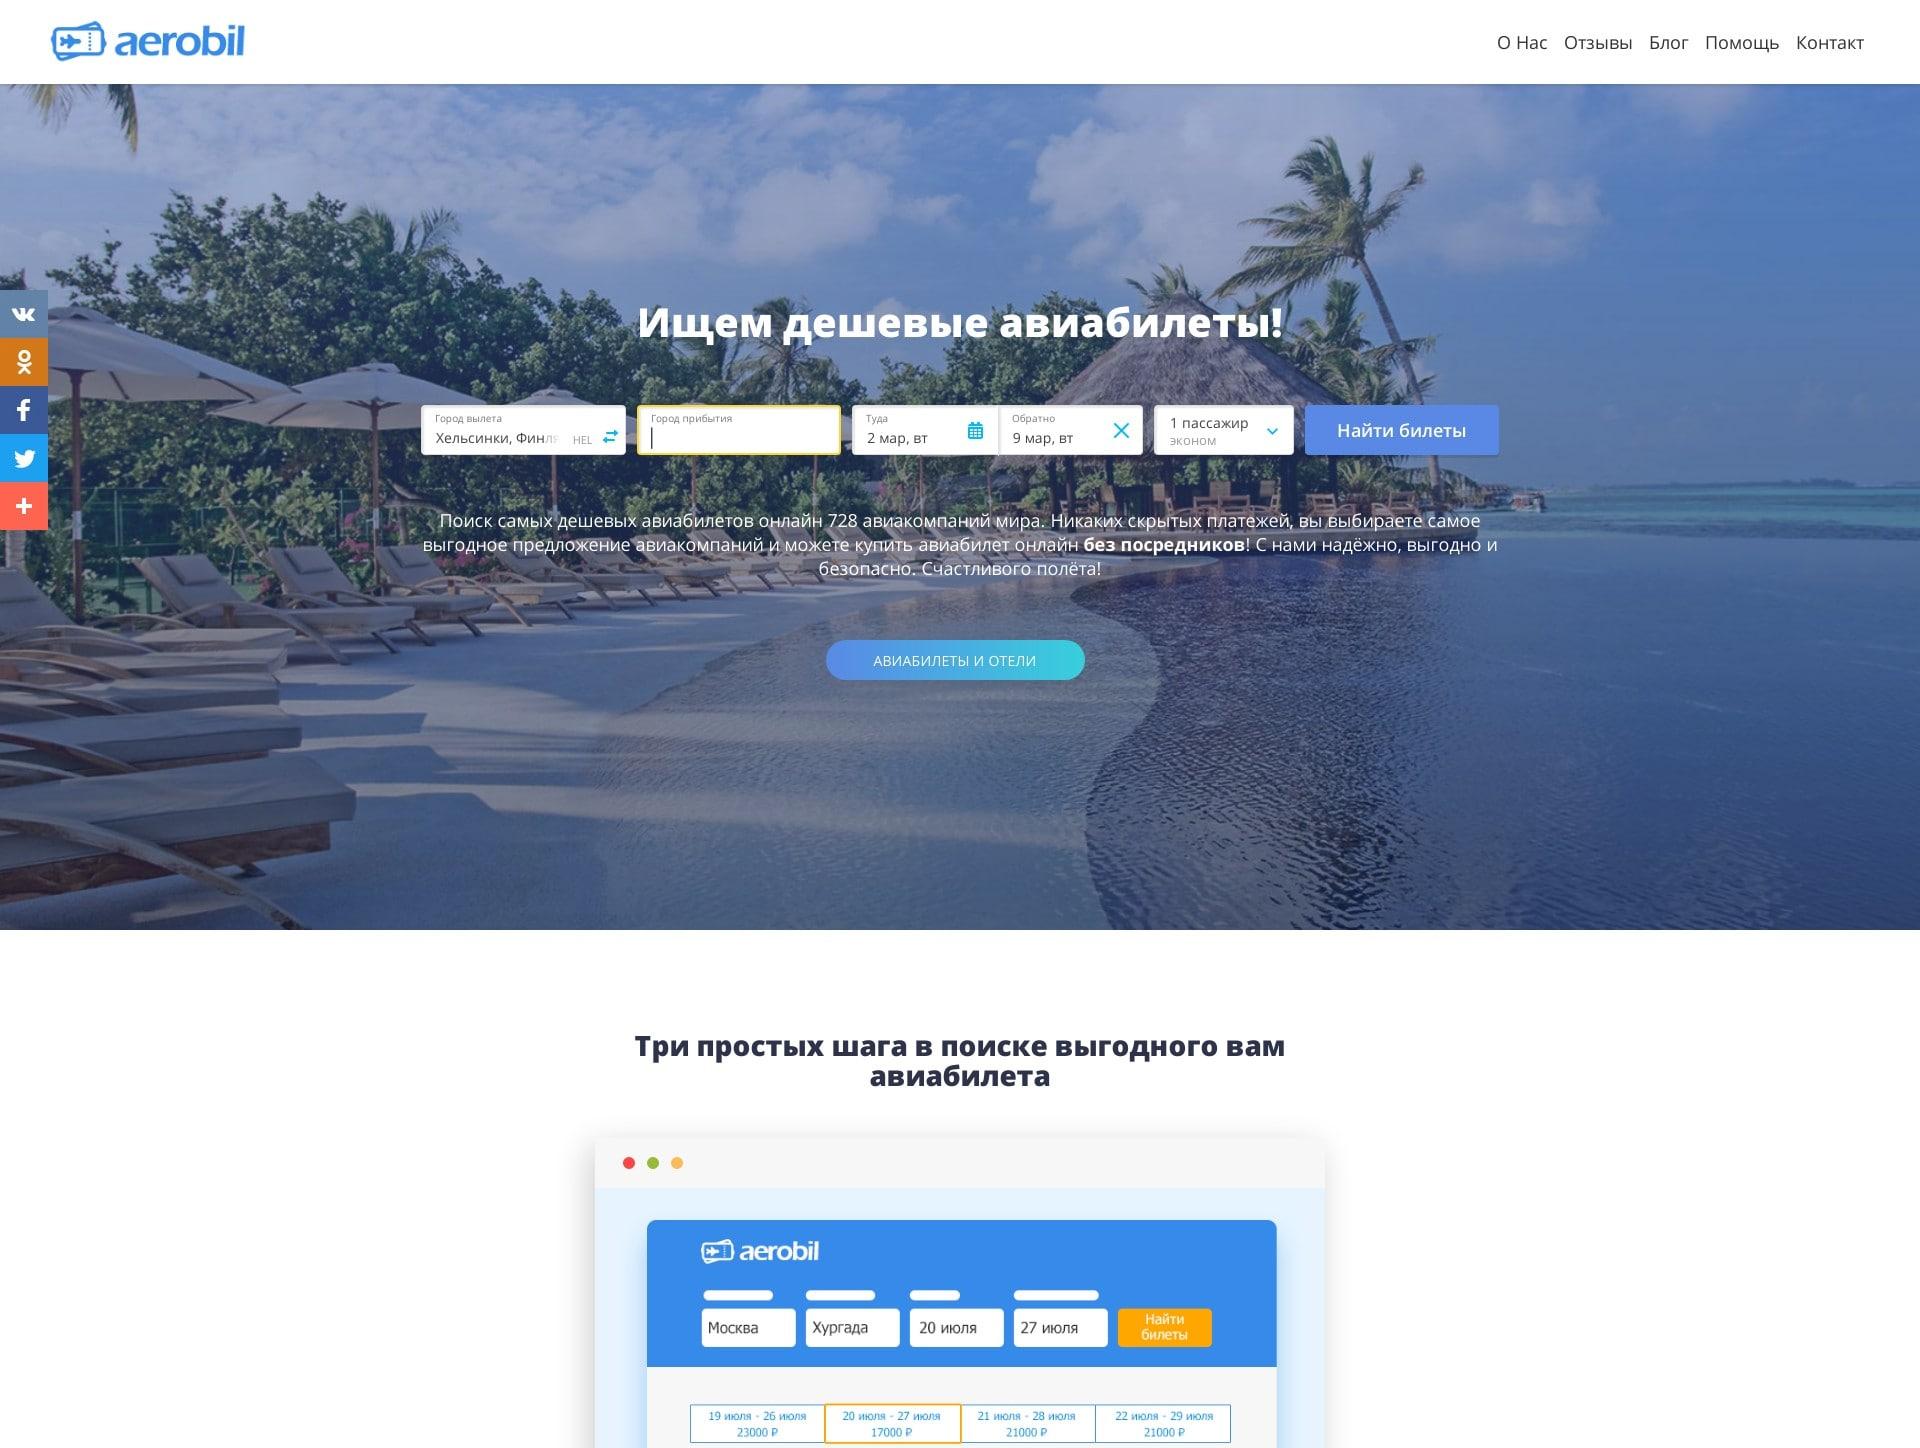 Aerobil - Сайт заказа авиабилетов